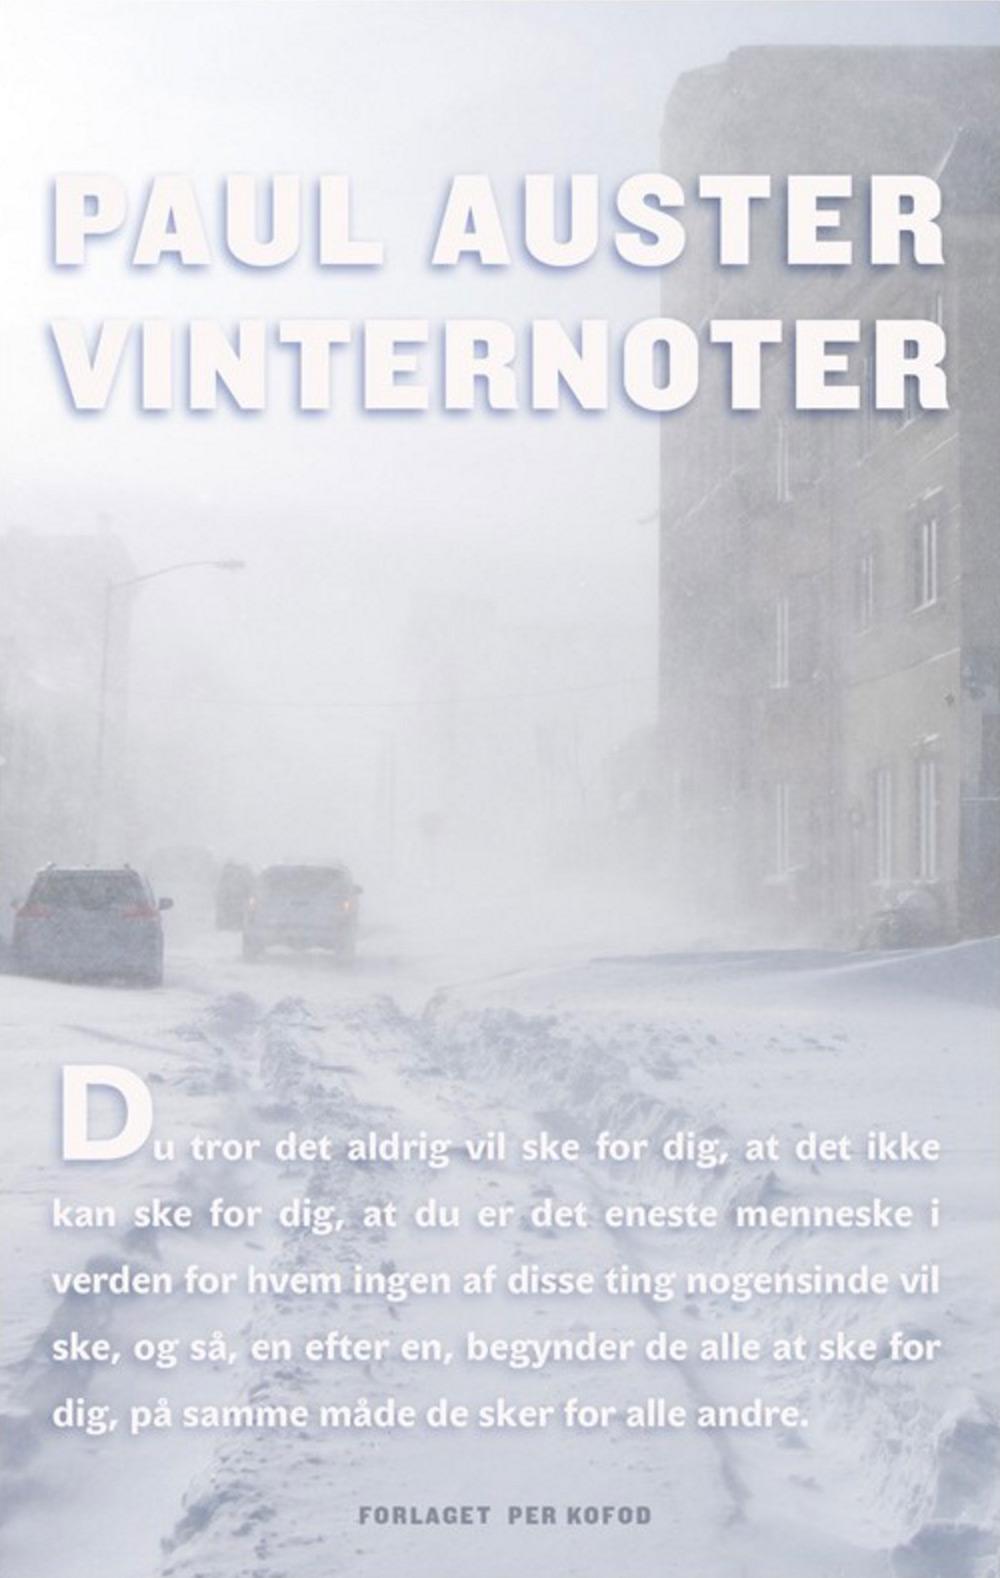 Vinternoter, Paul Auster